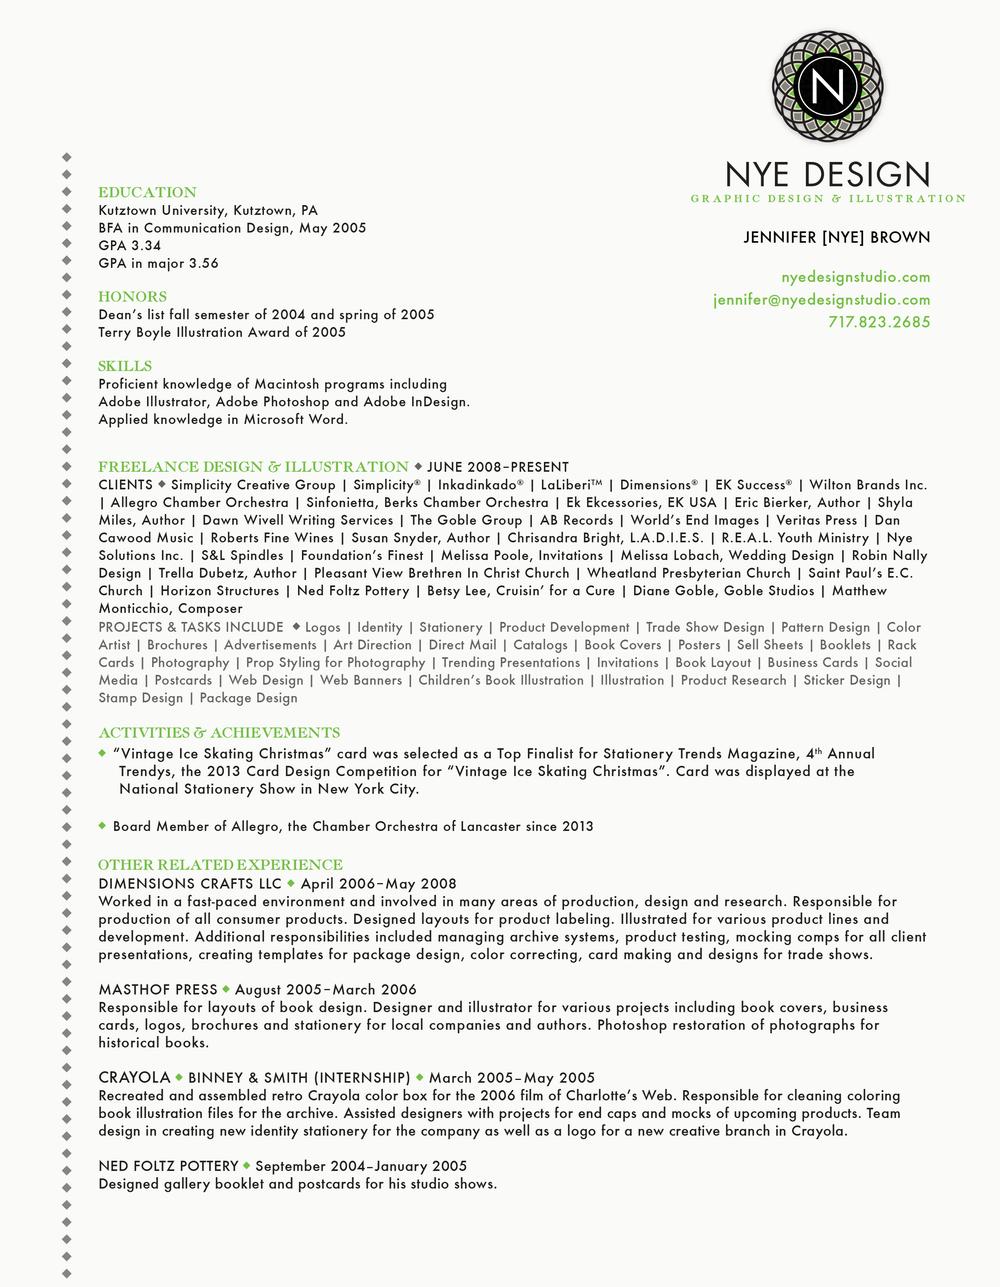 ND_Resume_2015.jpg